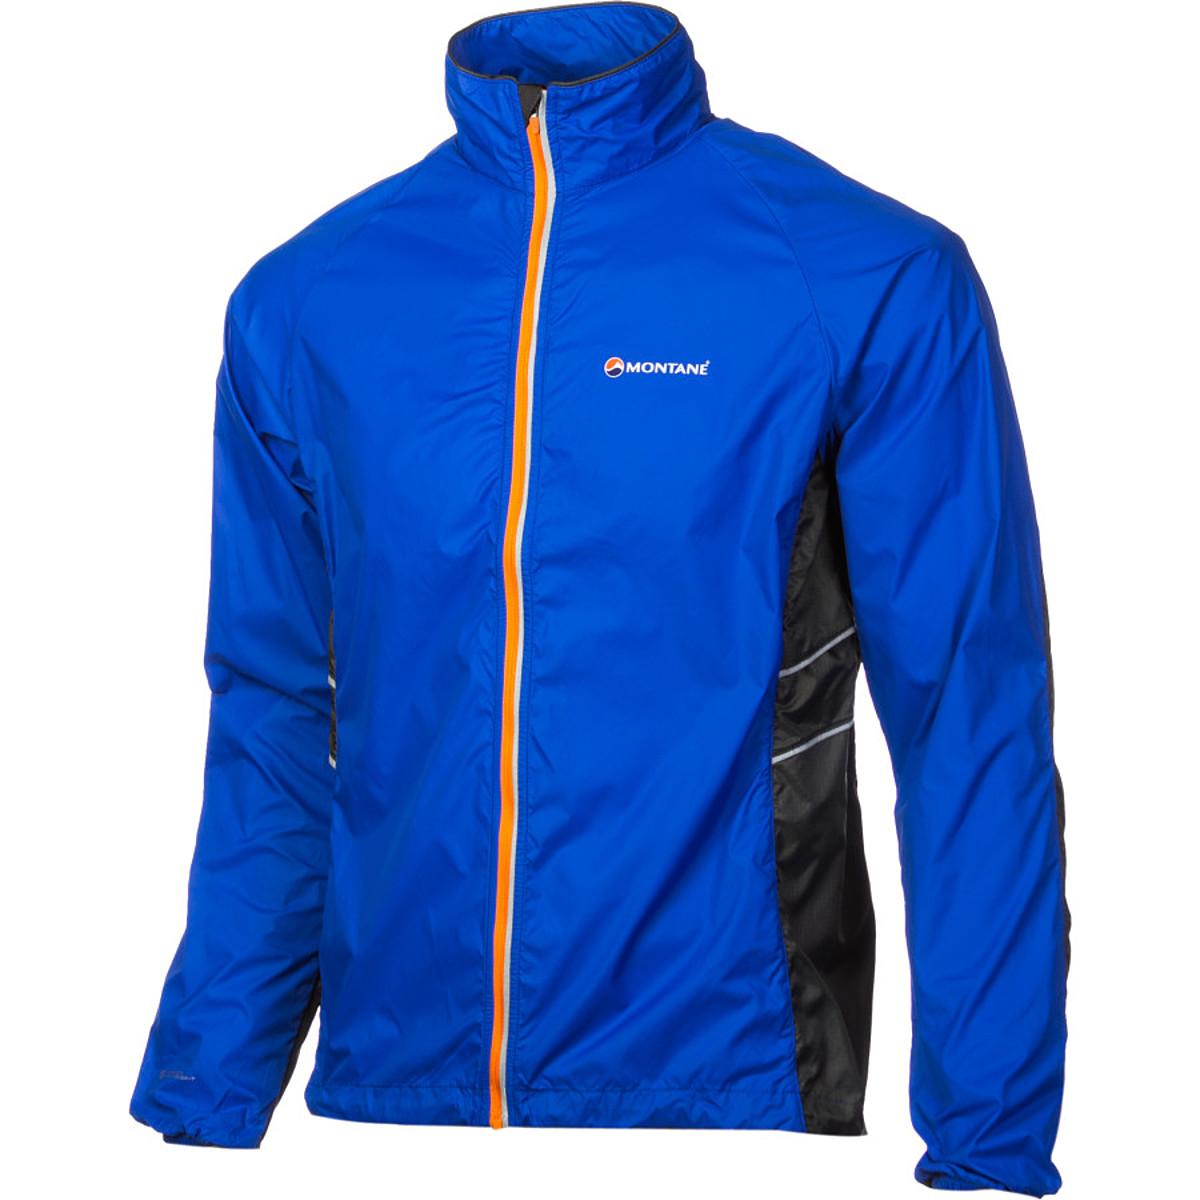 Montane Featherlite Marathon Jacket